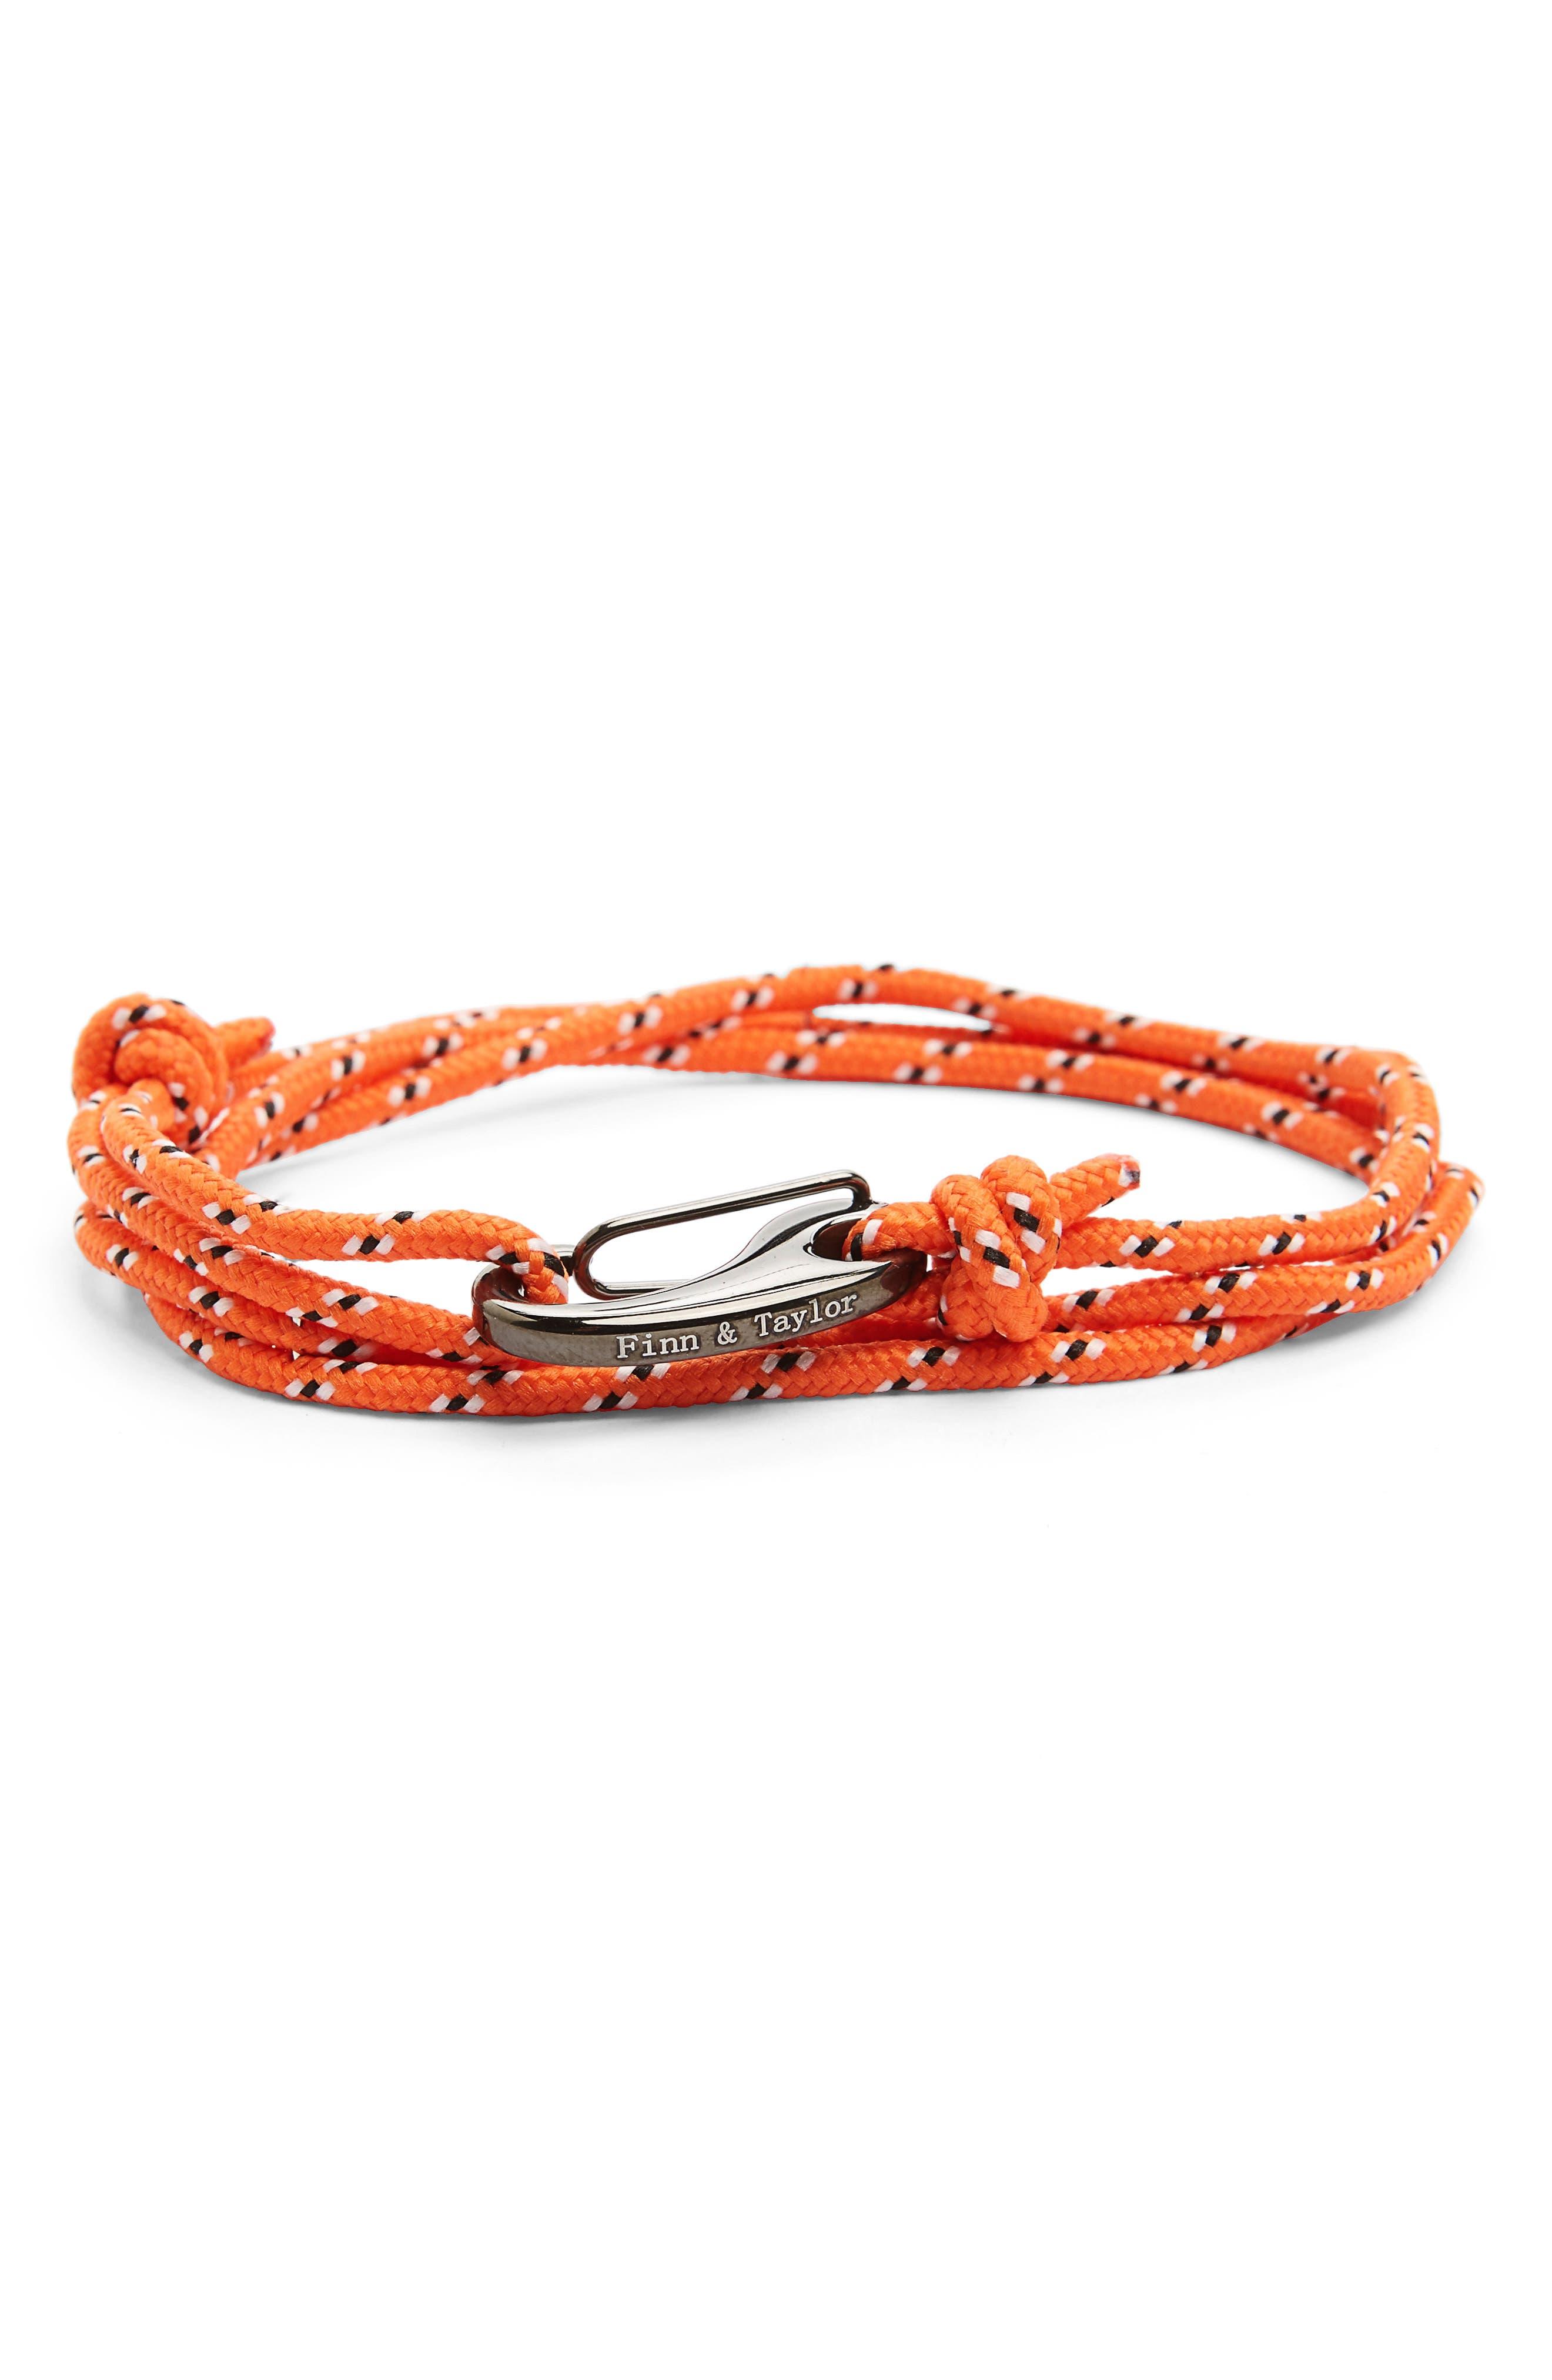 Finn & Taylor Wrap Bracelet,                         Main,                         color, Orange